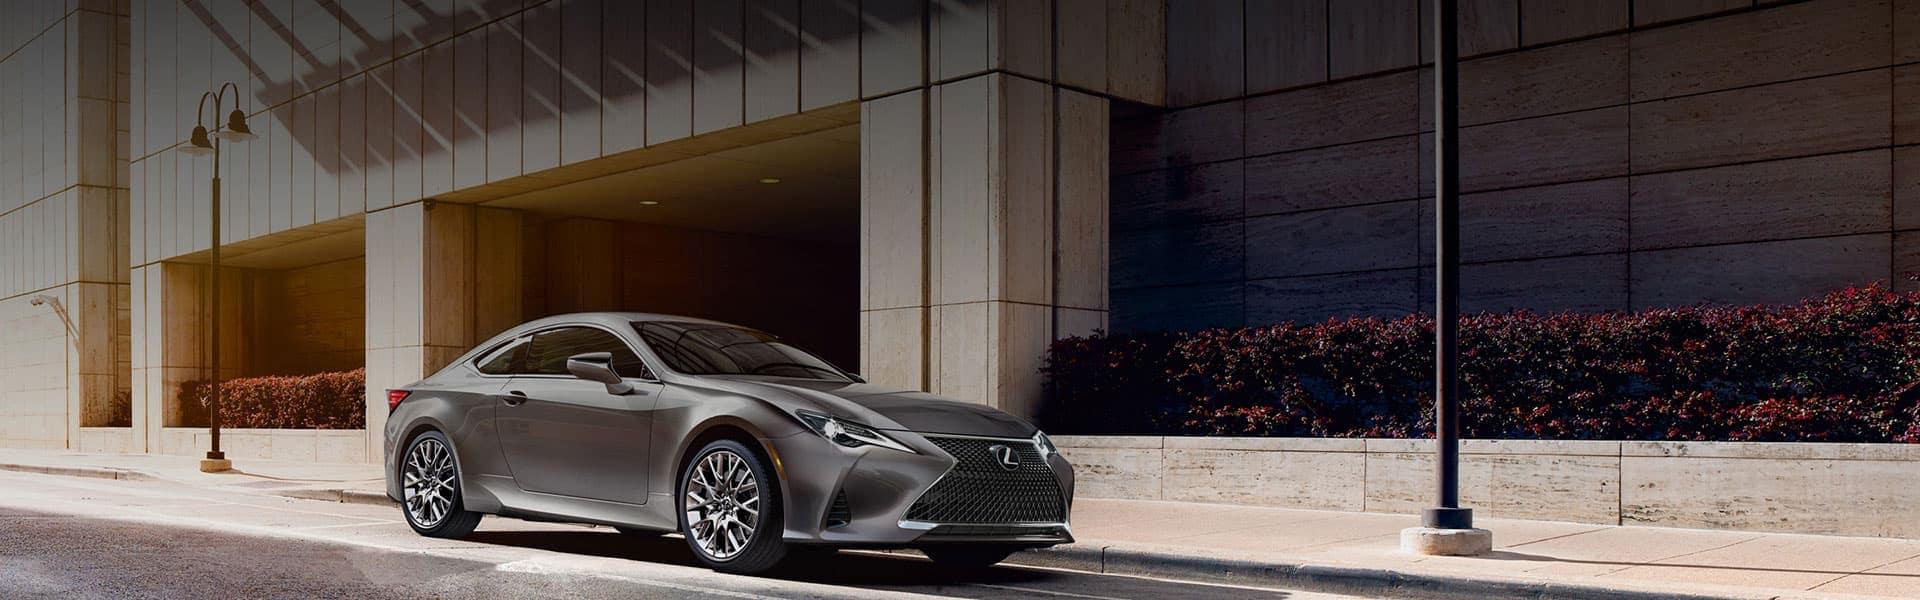 Lexus El Cajon welcome slider image - Lexus sedan parked outside a building in the city